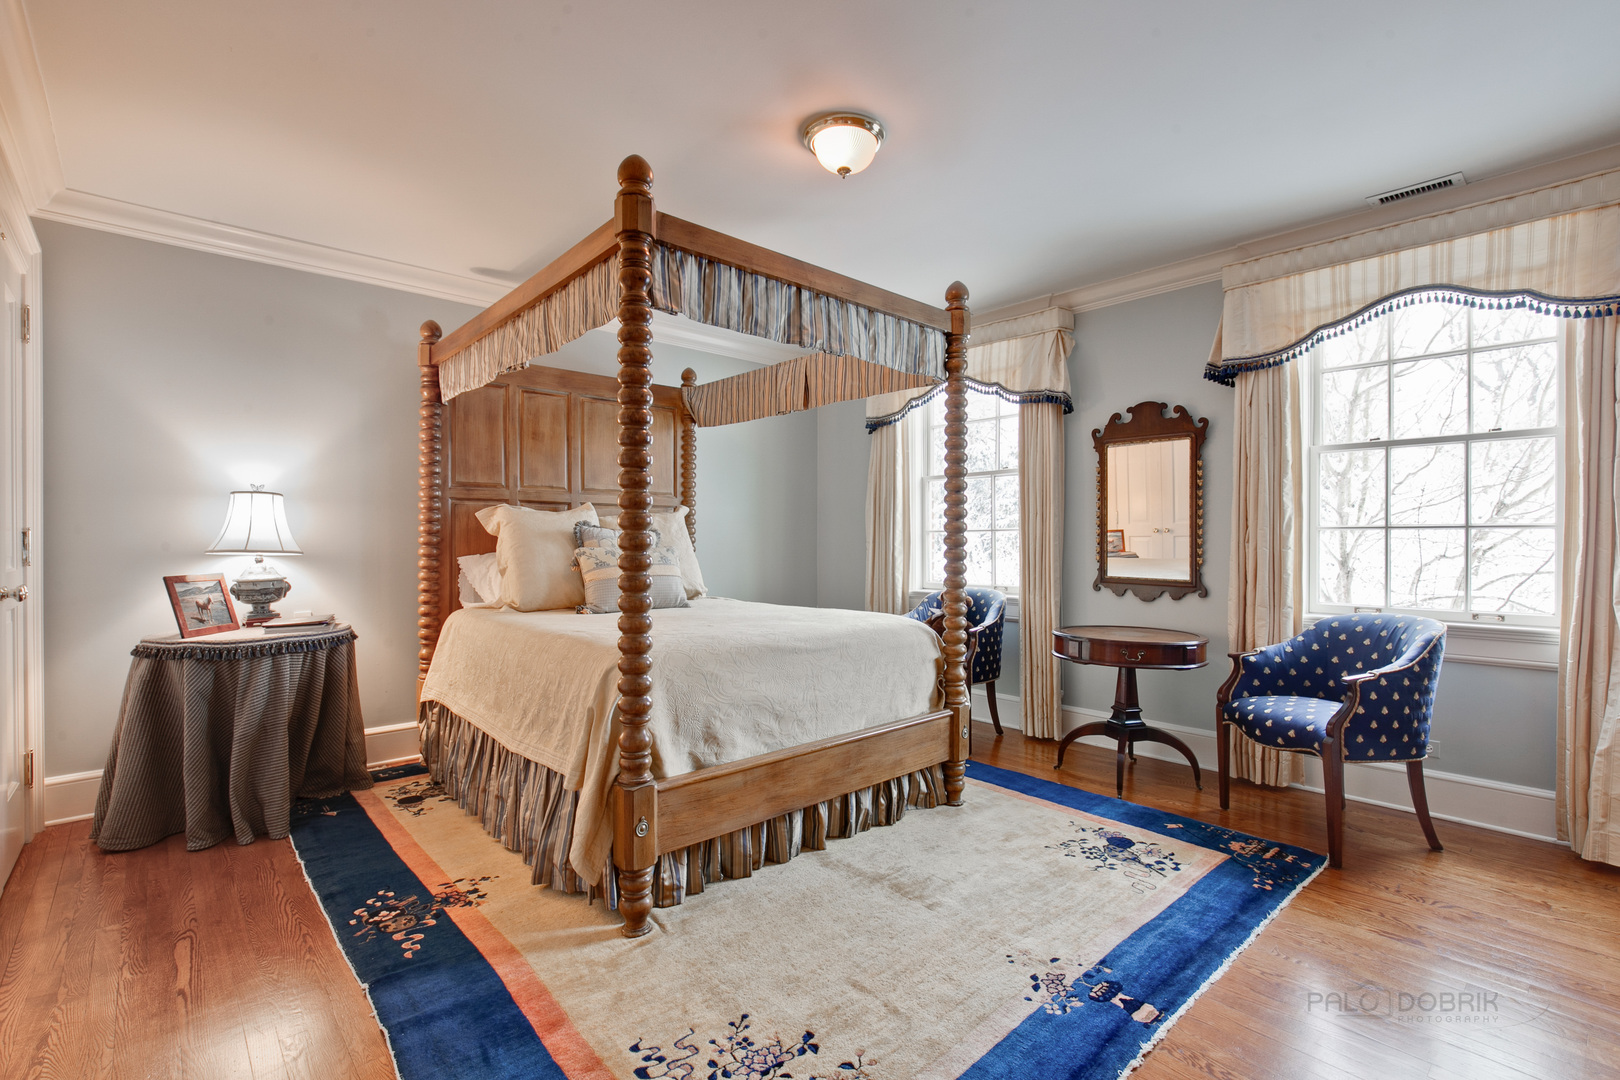 327 North Mayflower, Lake Forest, Illinois, 60045